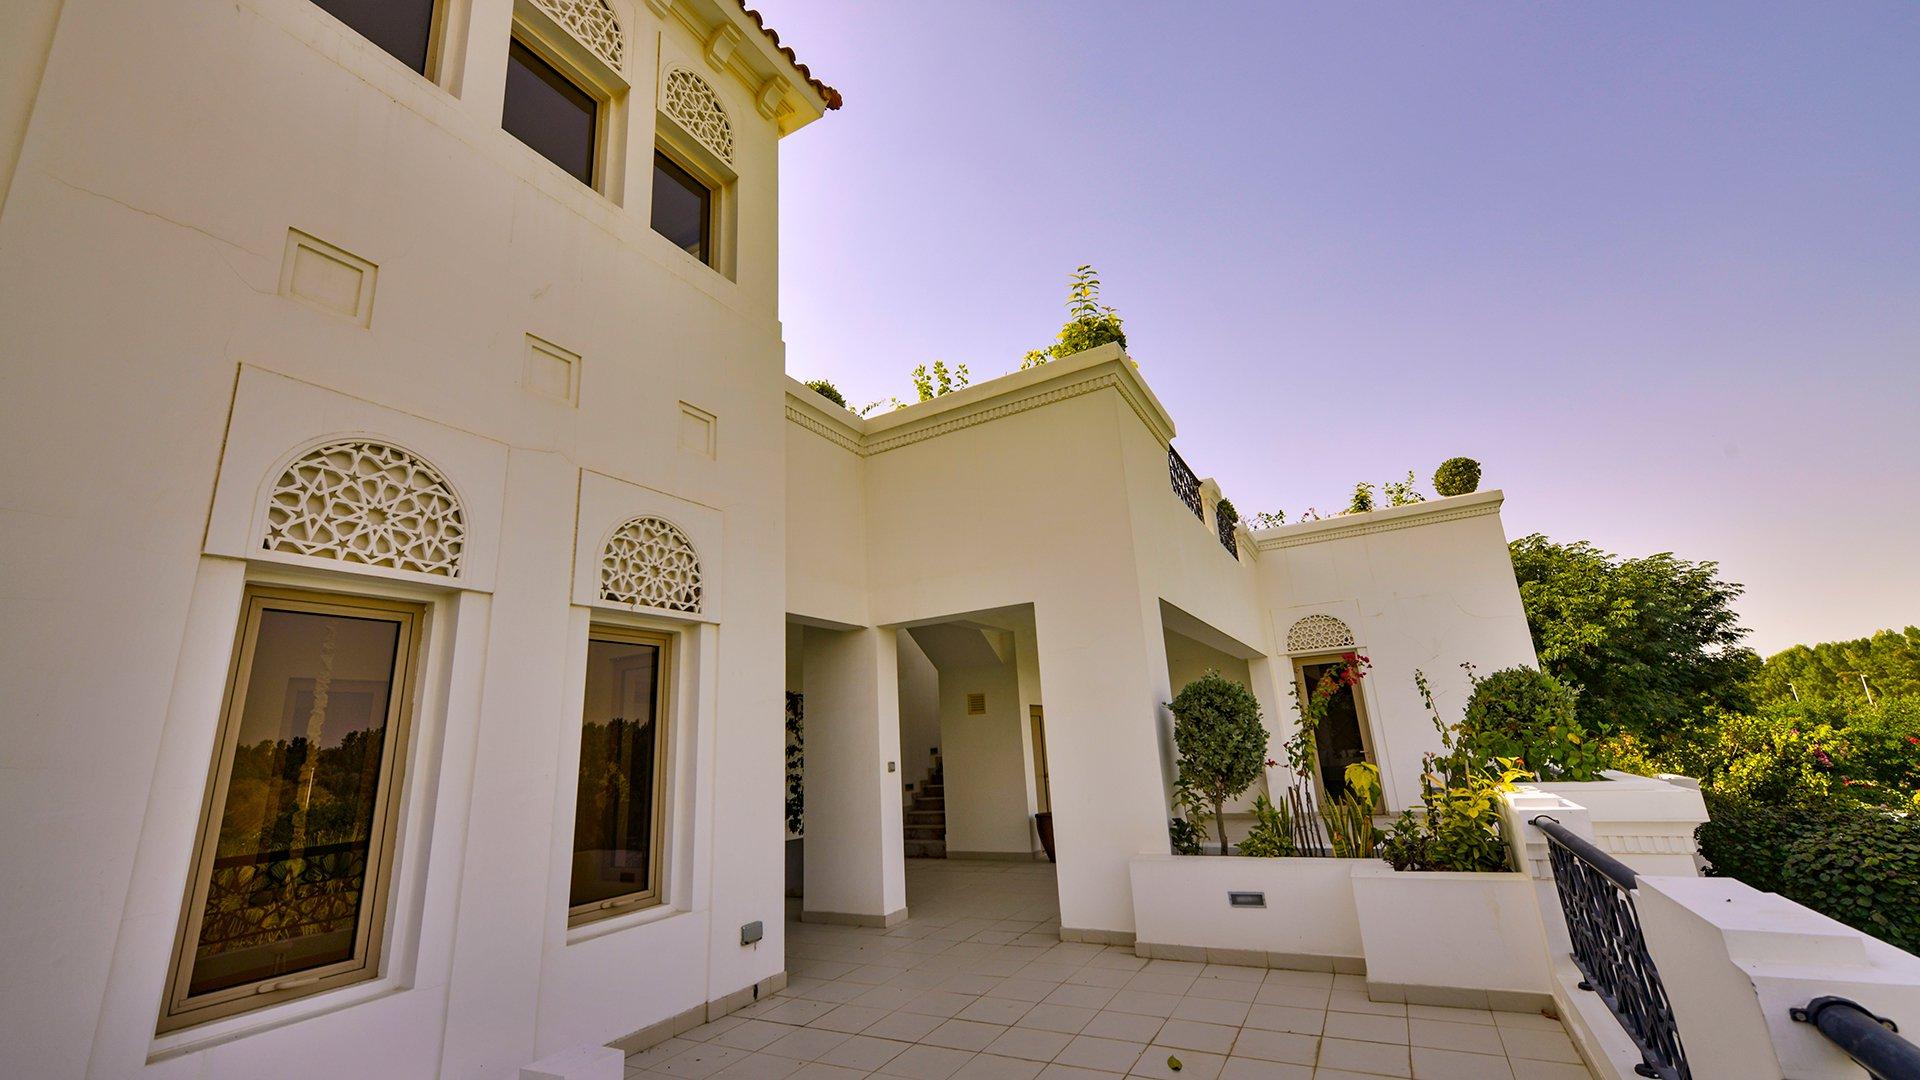 Ad Sale Villa Dubailand Al Barari Ref V0499du